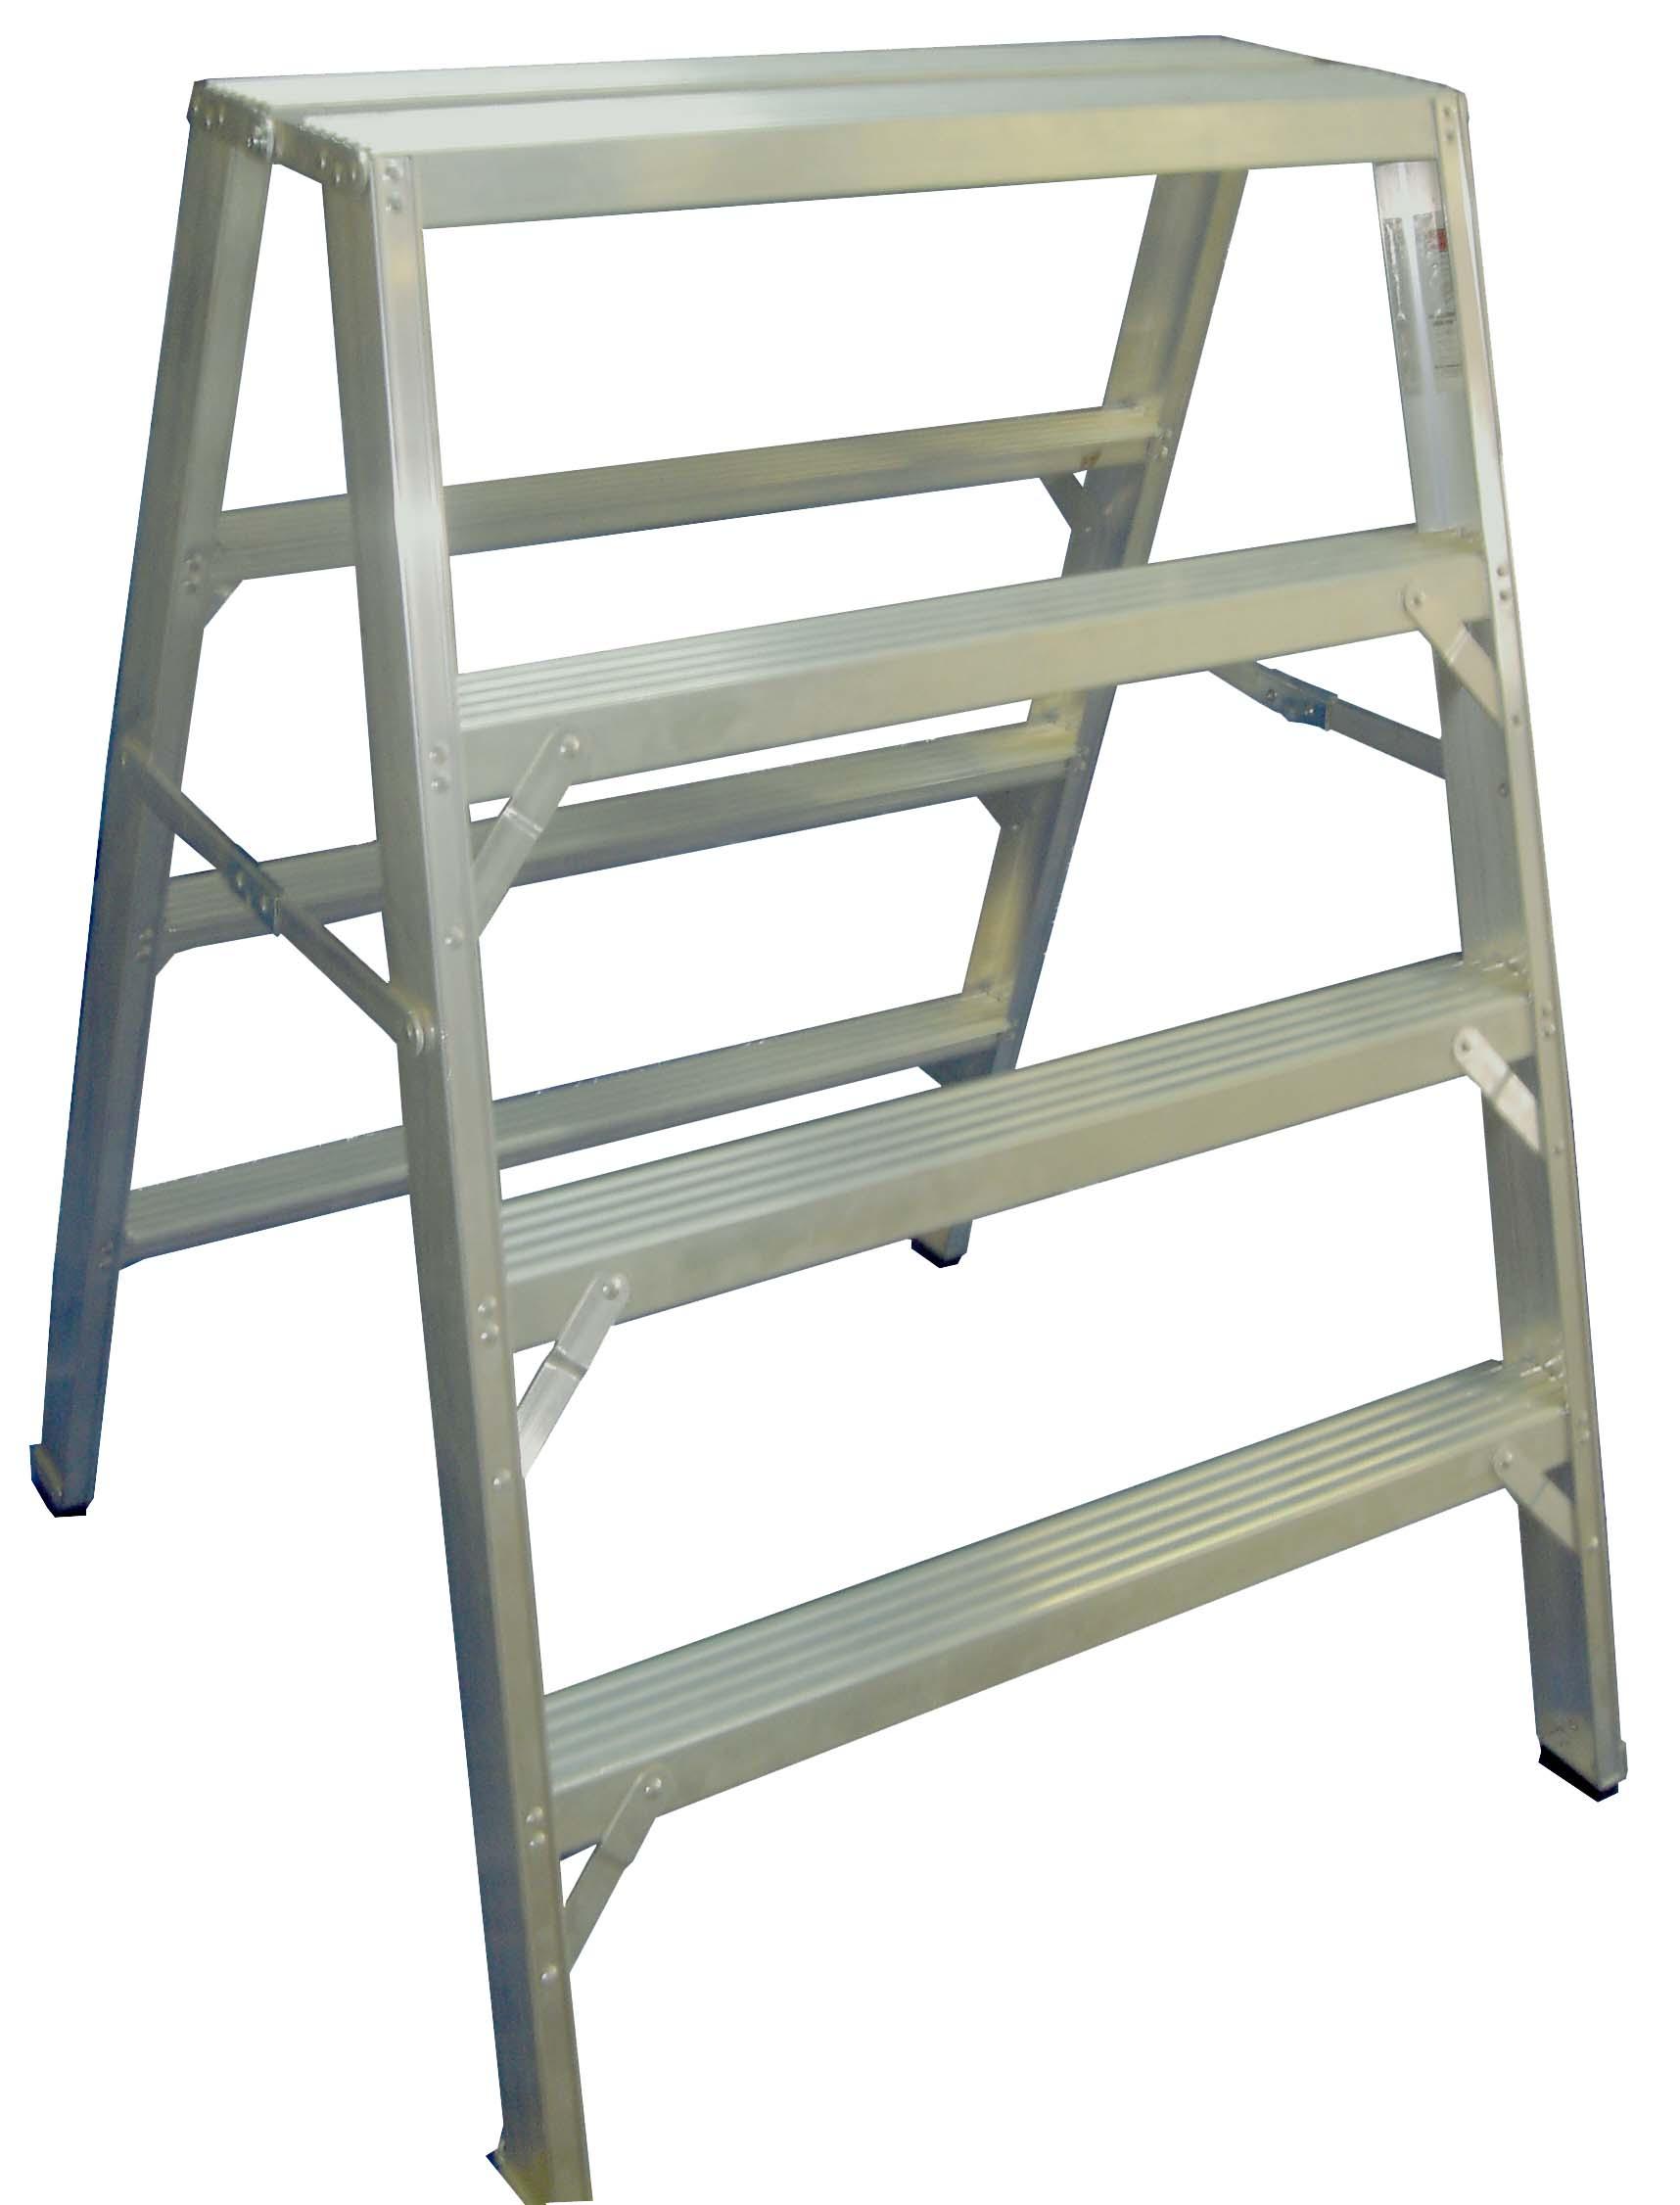 4' aluminium trigger bench